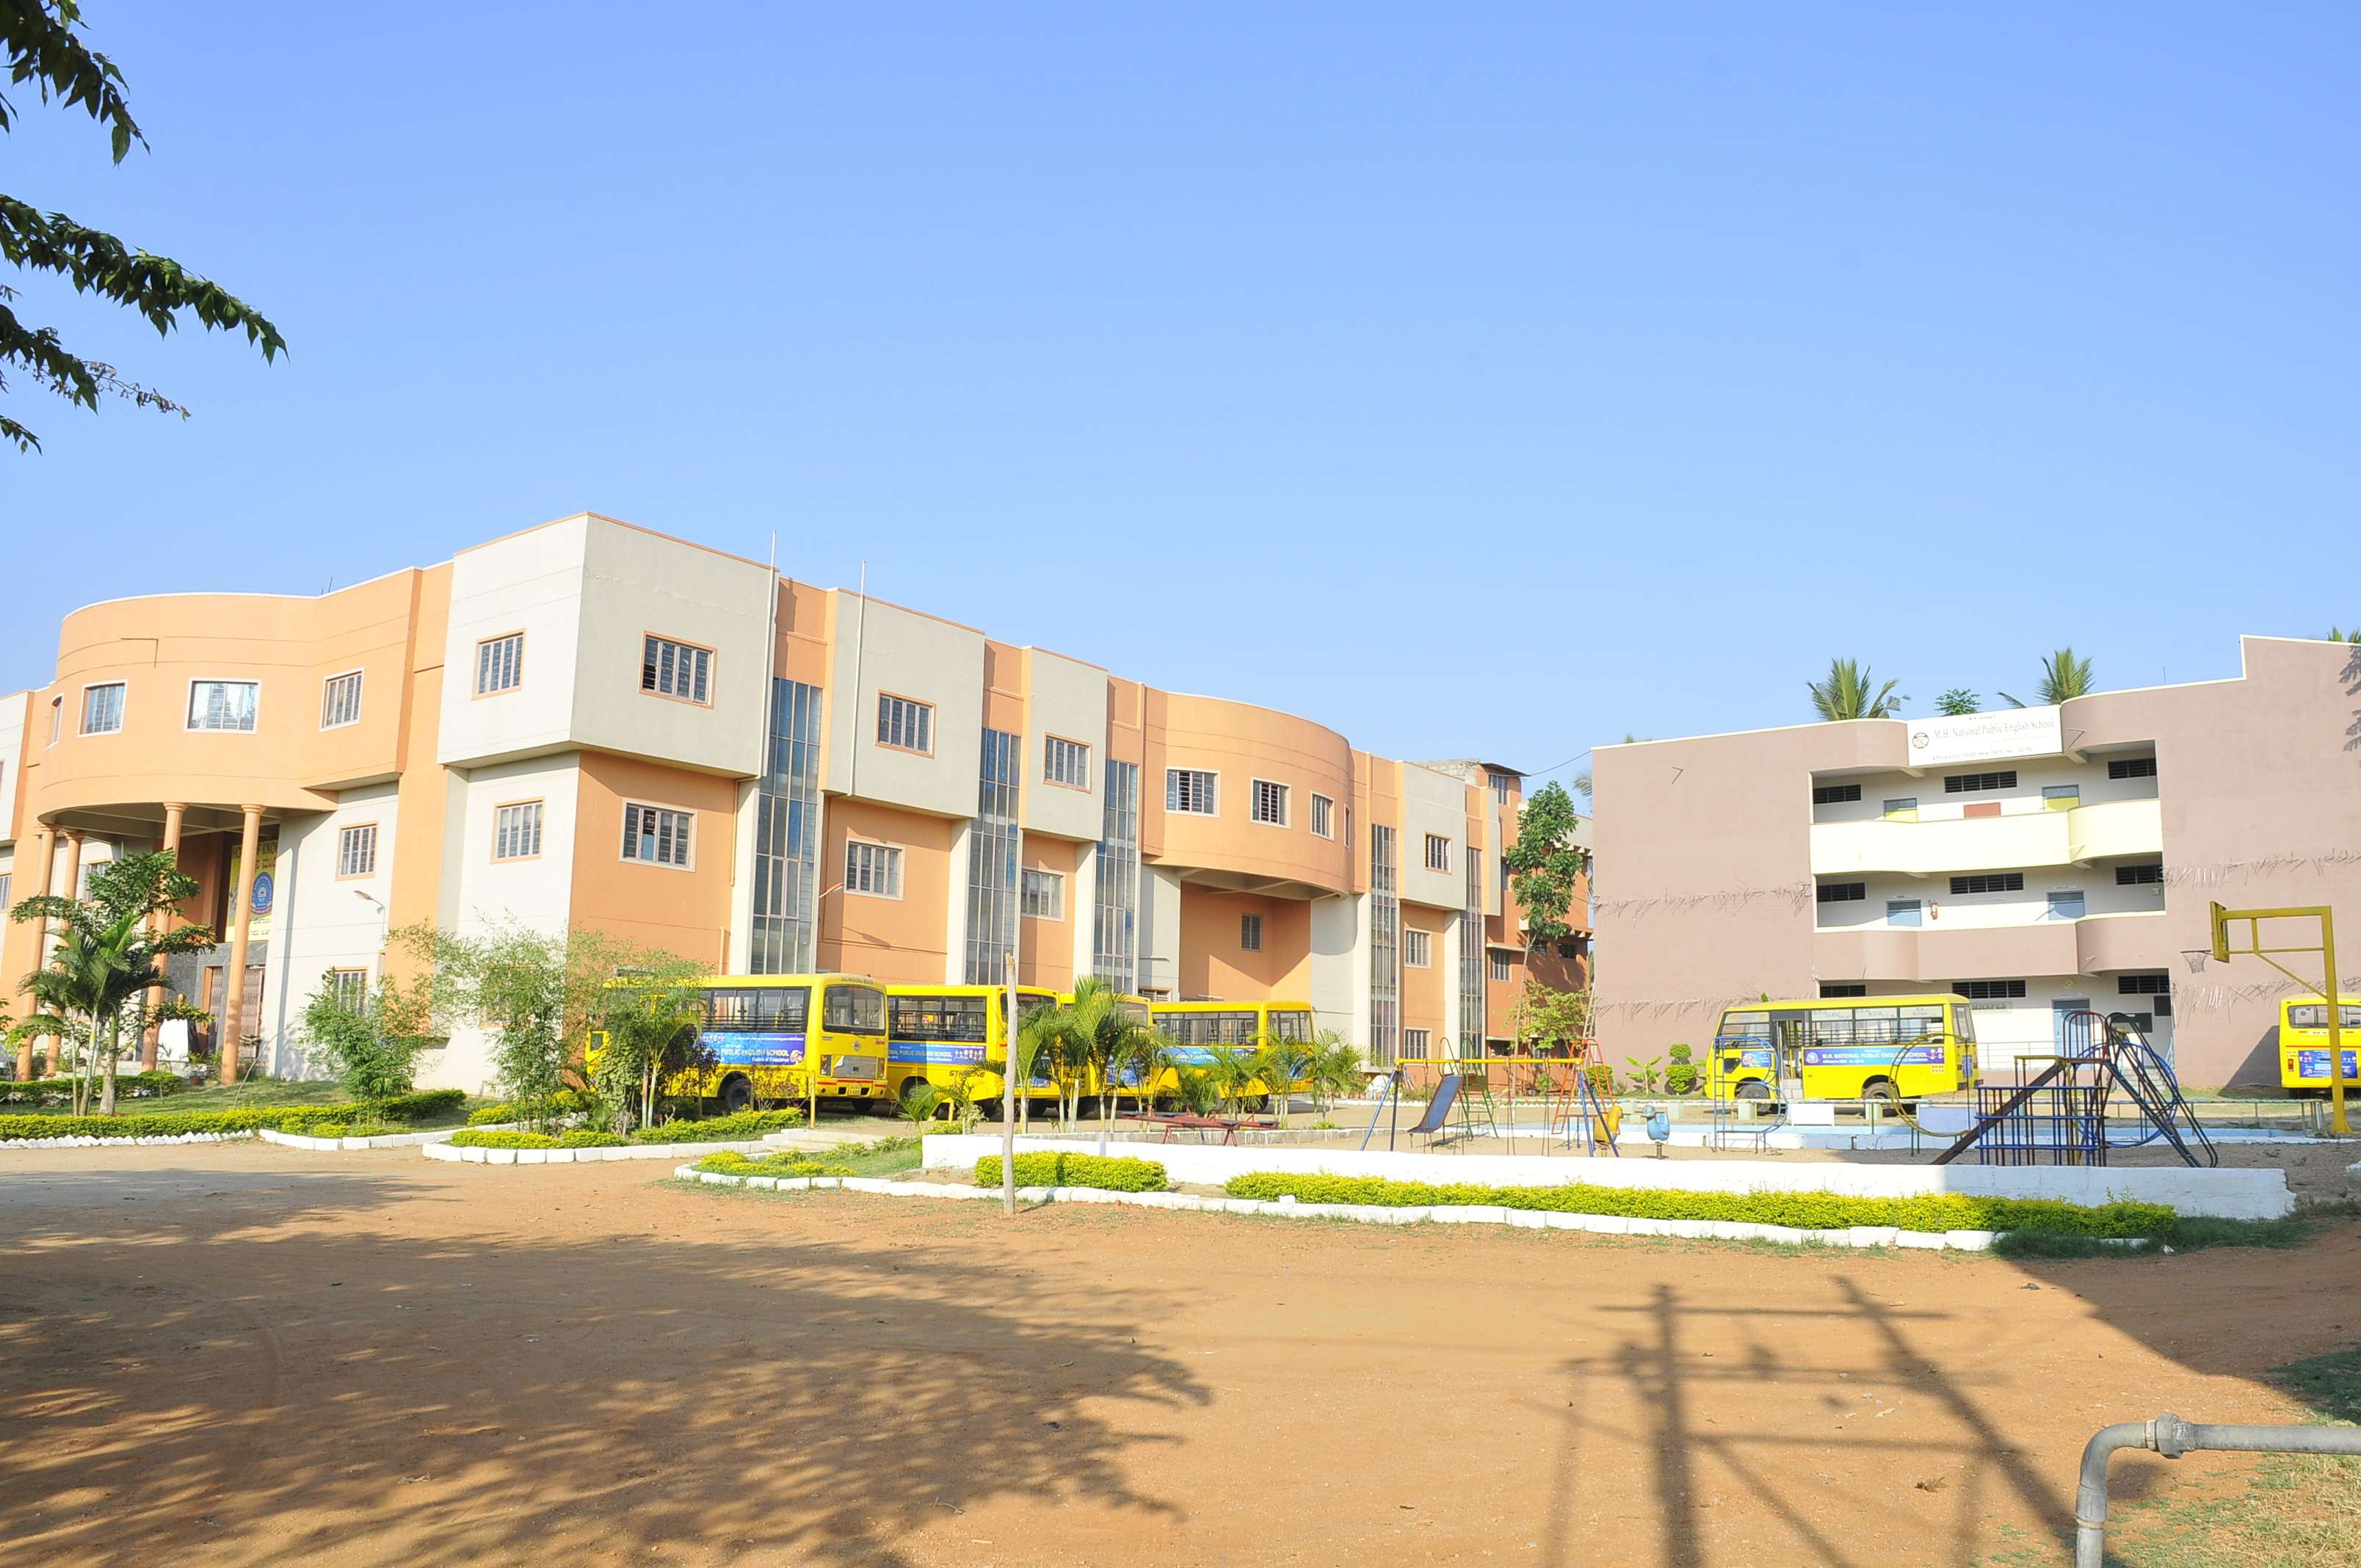 M H National Public English School B M Road Vivekananda Nagar Ramanagaram 830192